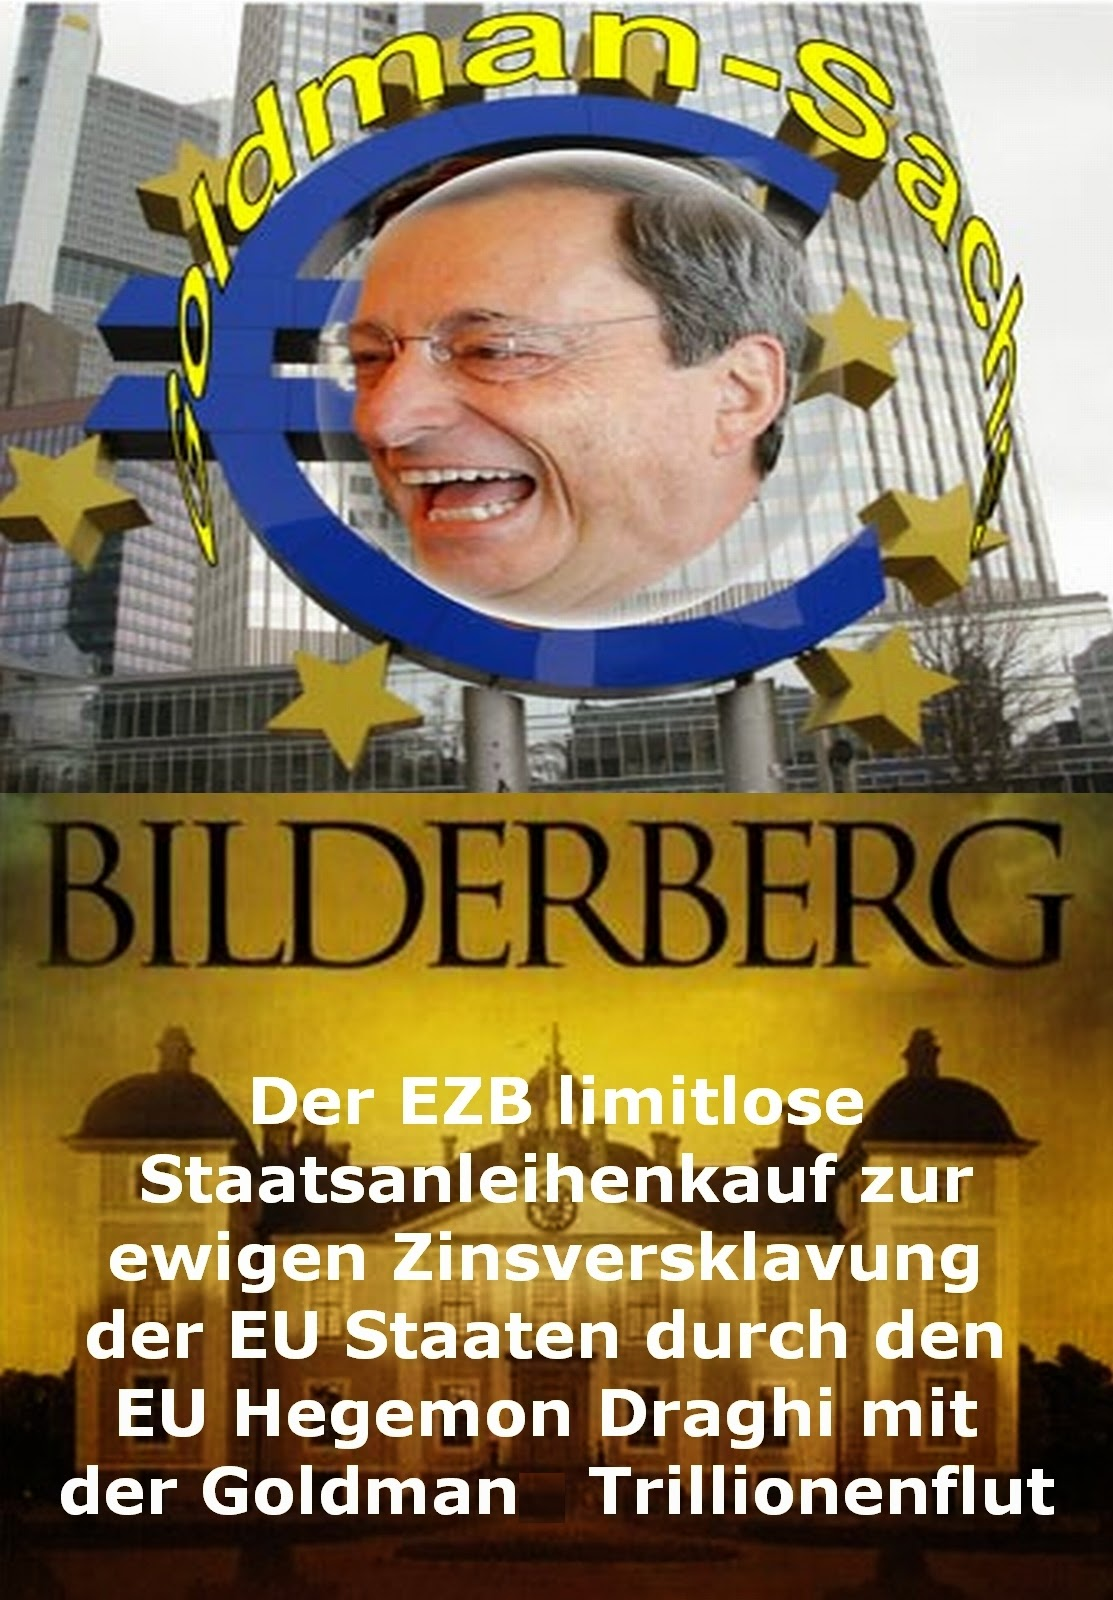 Photo: Goldman & Sachs8v10 Mario Draghi EZB. http://youtu.be/91YhC5togJ0  <Finanzforum>http://www.iphpbb.com/board/ftopic-88737338nx56623-502.html http://www.informarexresistere.fr/2014/05/14/goldman-prima-che-draghi-vi-aiuti-dovrete-peggiorare/ http://globalfire.tv/nj/12de/politik/wall_street_eliminiert_bundesbank.htm https://www.facebook.com/Bruno.Wanderer/posts/10203829771047139 https://plus.google.com/110755859271321809326/posts/PYxMM1mXahp https://twitter.com/BrunoWanderer/status/561333996651806721